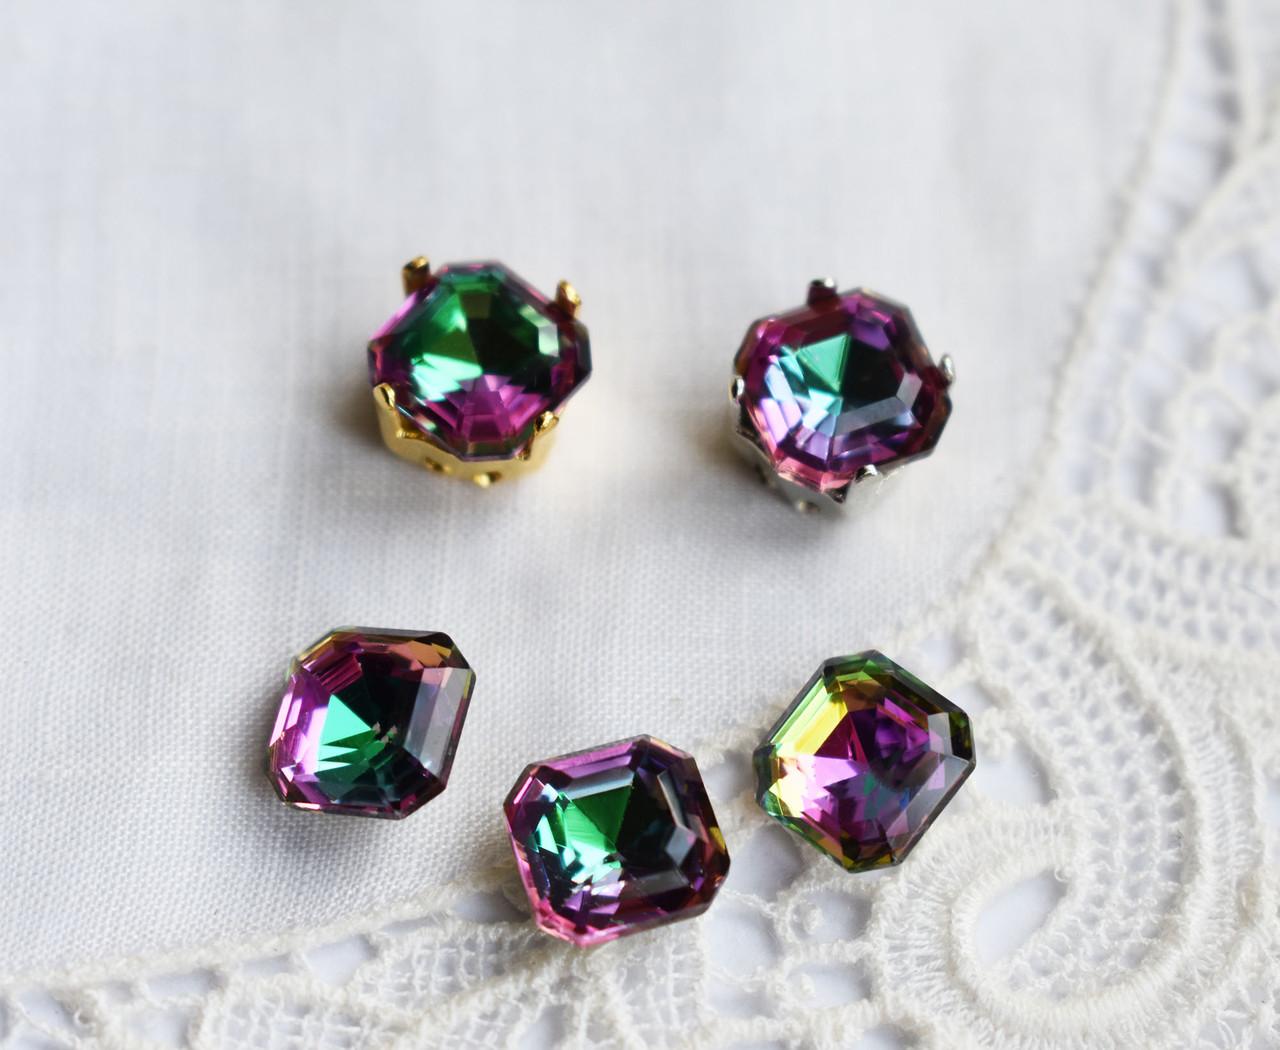 Стразы стеклянные 8 мм (SS39), зелено-желто-розовые